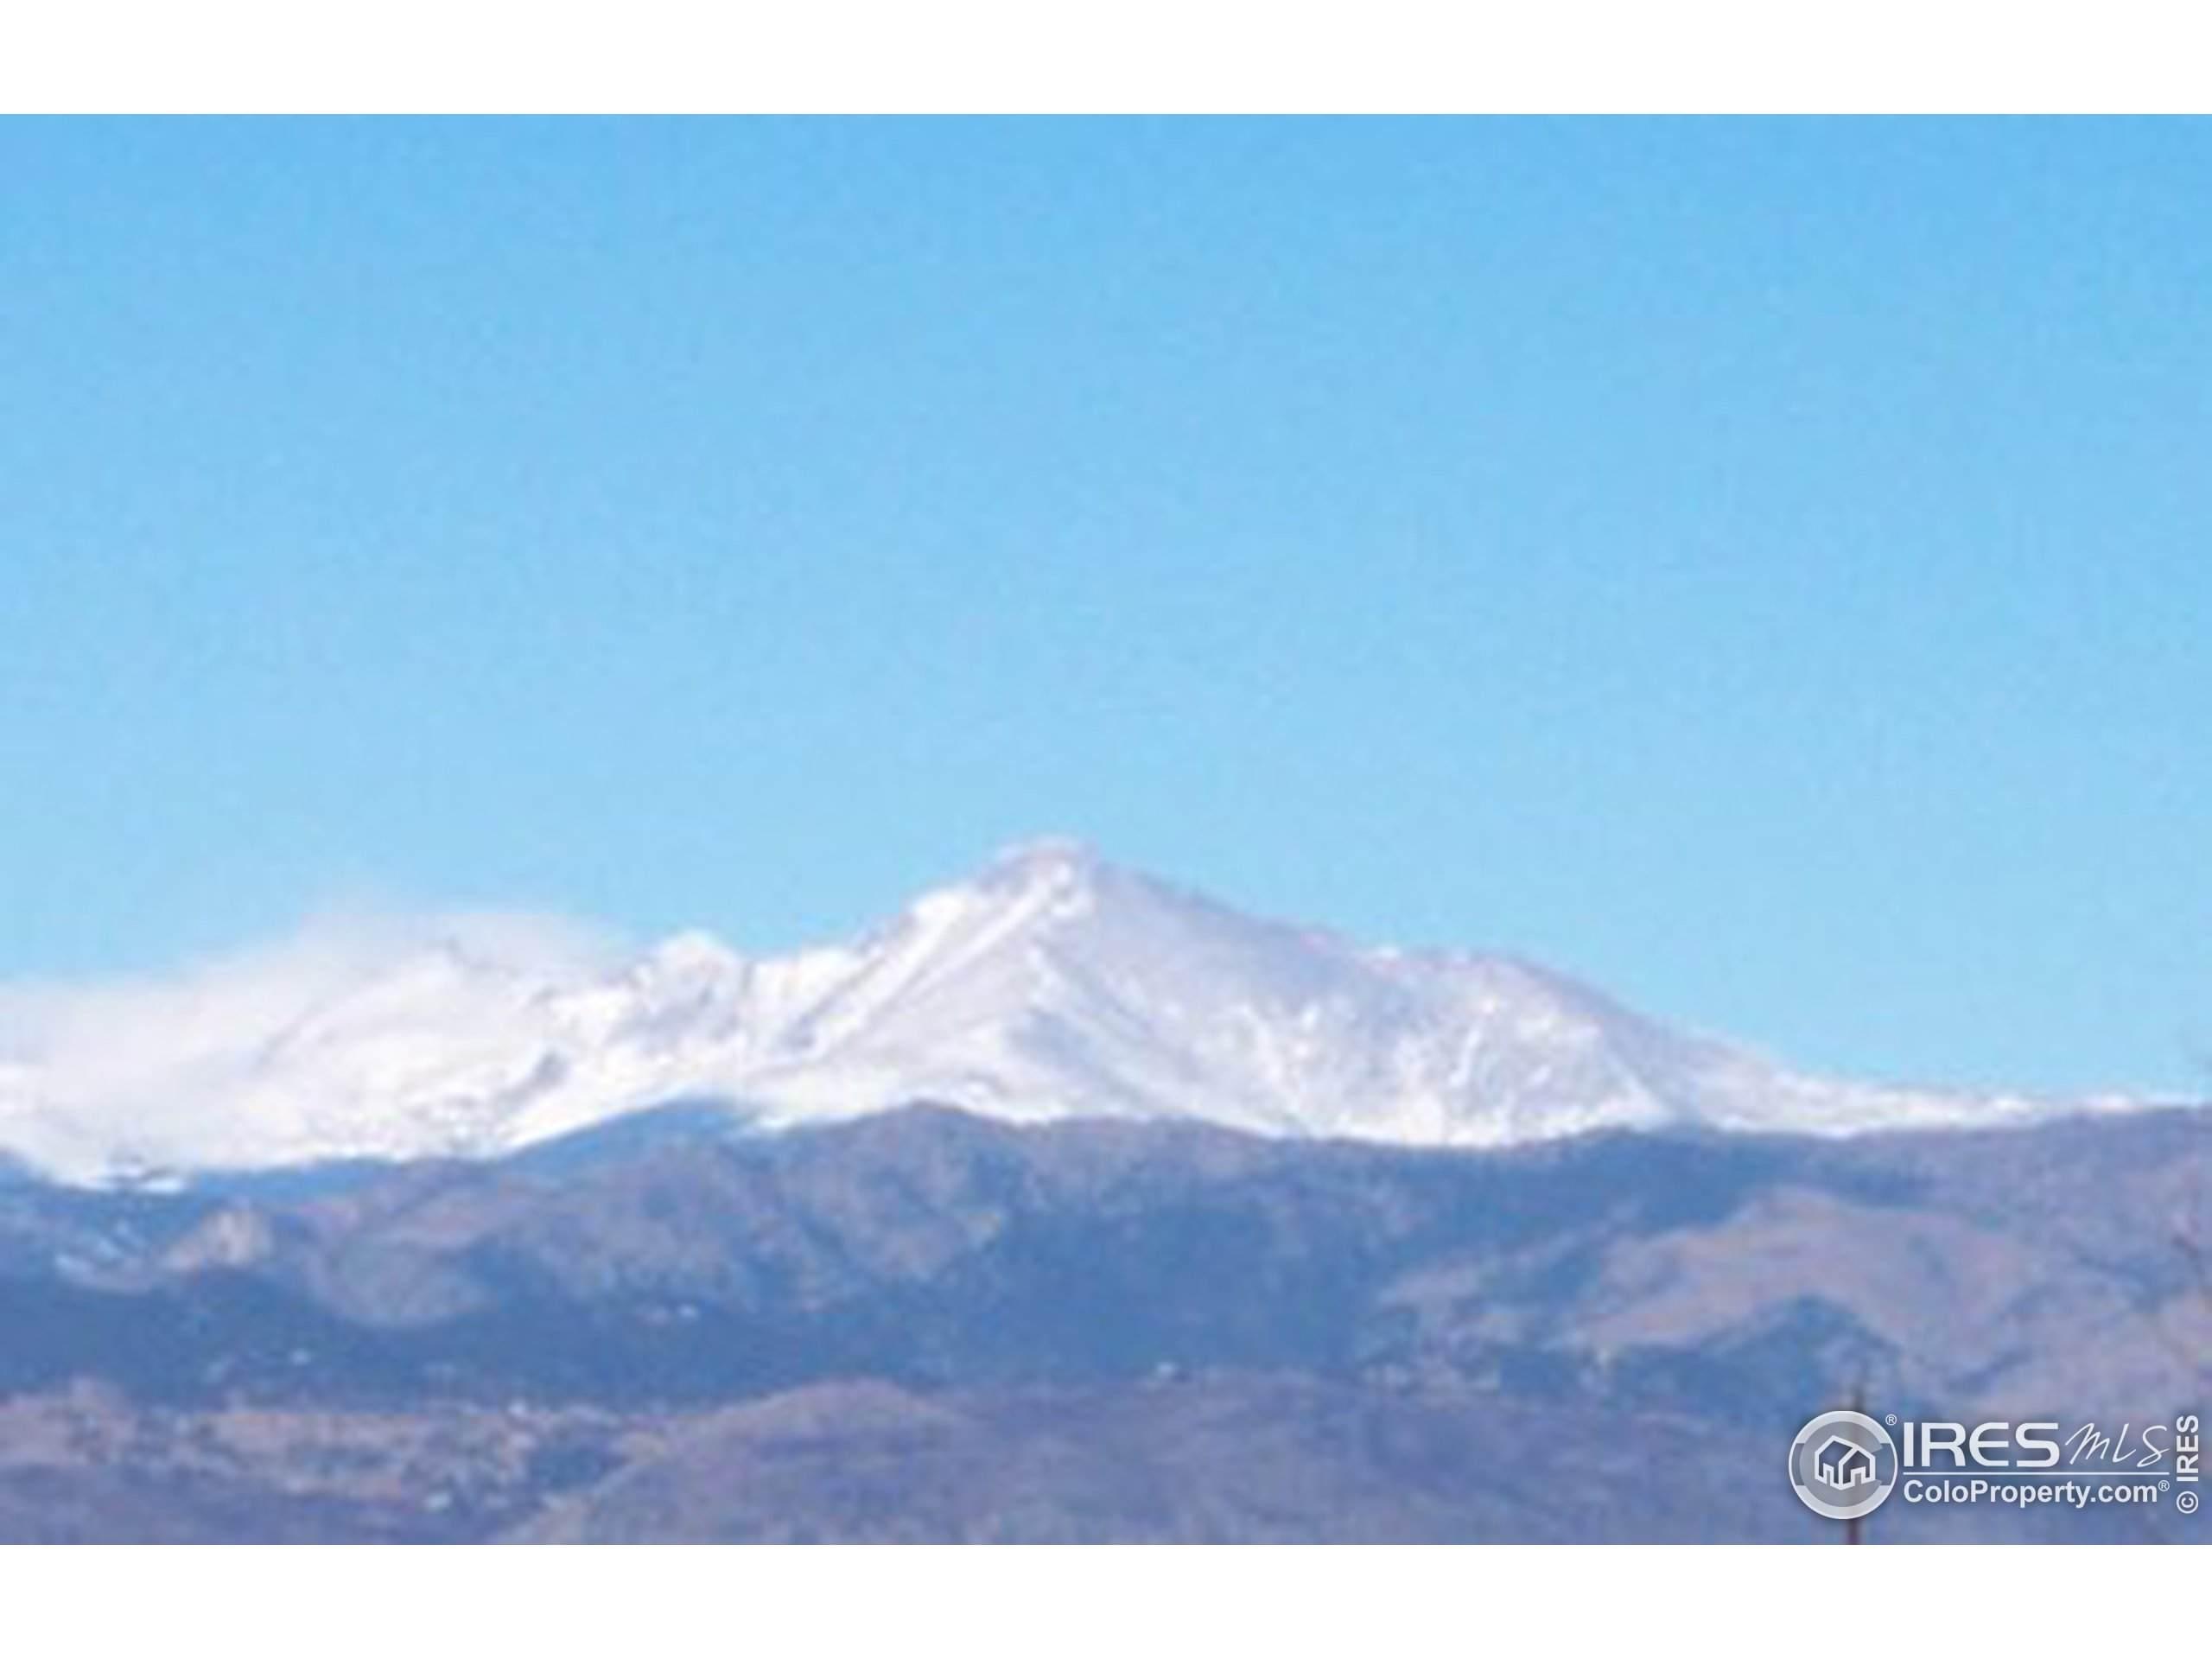 4211 Suncrest Ct, Fort Collins, CO 80525 (MLS #927209) :: Colorado Home Finder Realty